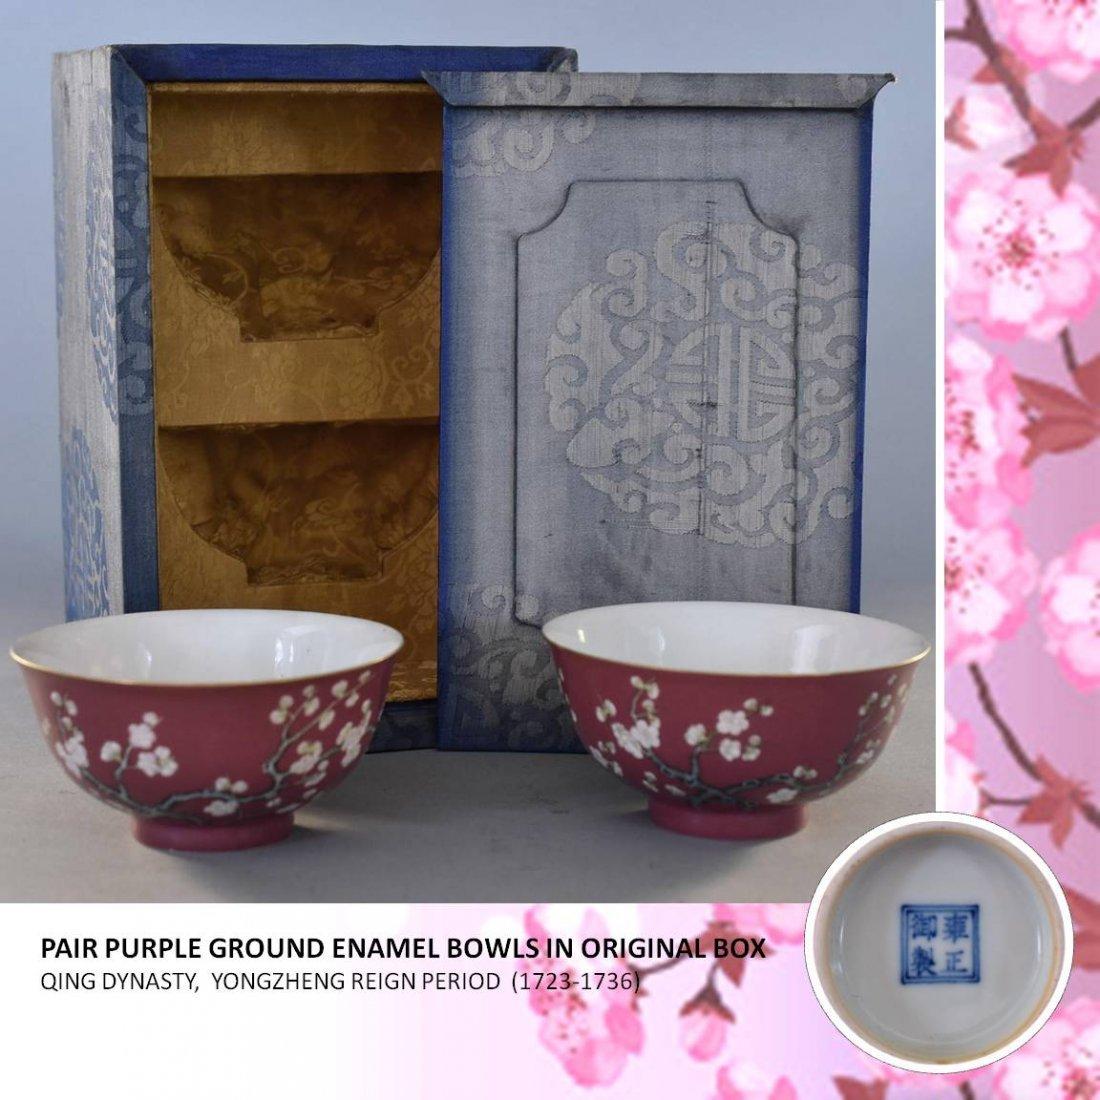 PAIR PURPLE GROUND ENAMEL BOWLS IN ORIGINAL BOX